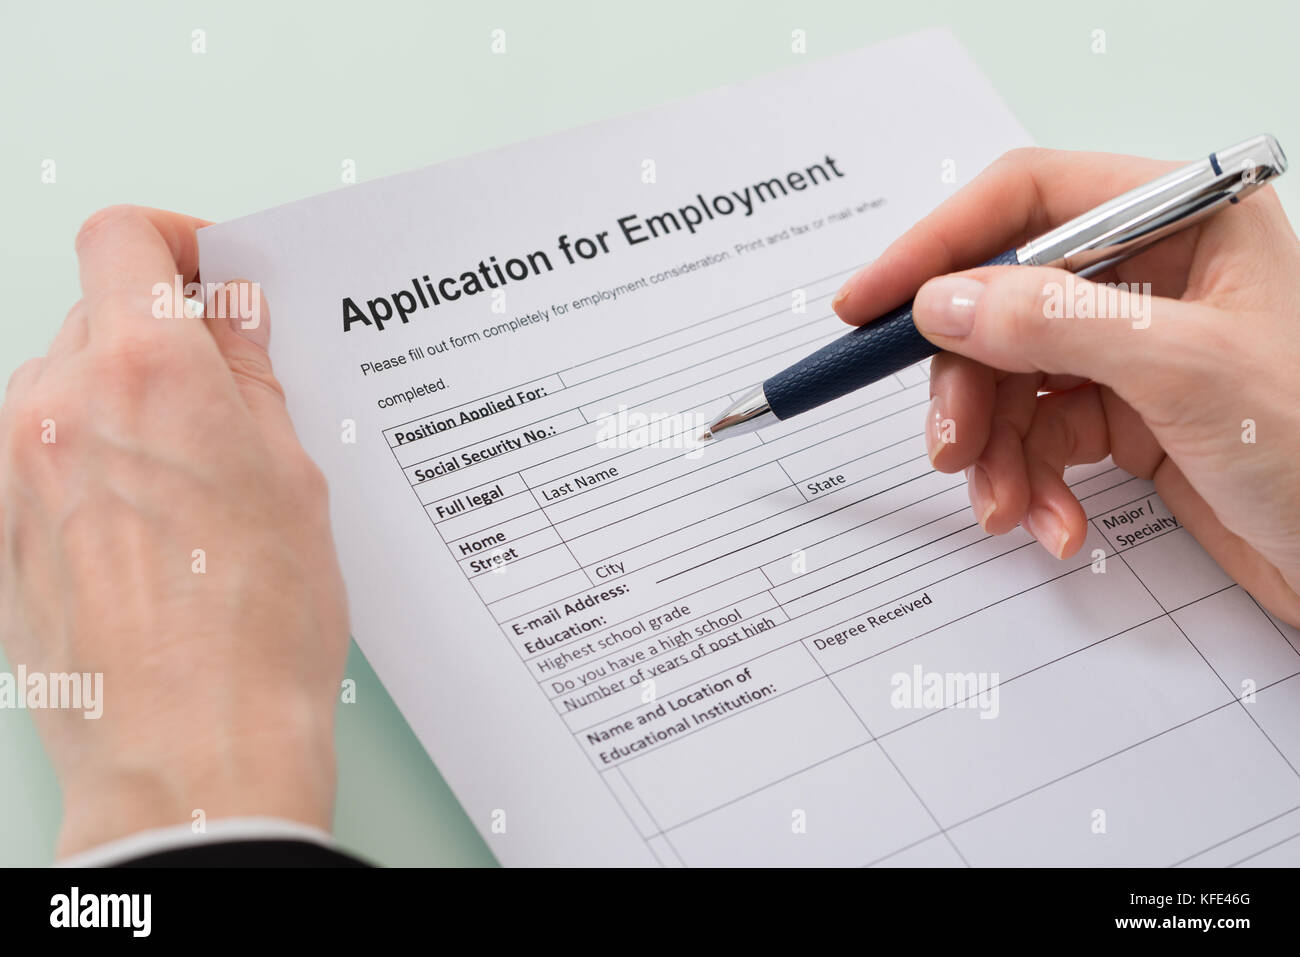 Job Application Form Stock Photos & Job Application Form Stock ... on seasonal jobs, office jobs, typist jobs, part-time jobs, remote jobs, educational jobs, nursing home jobs, networking jobs,